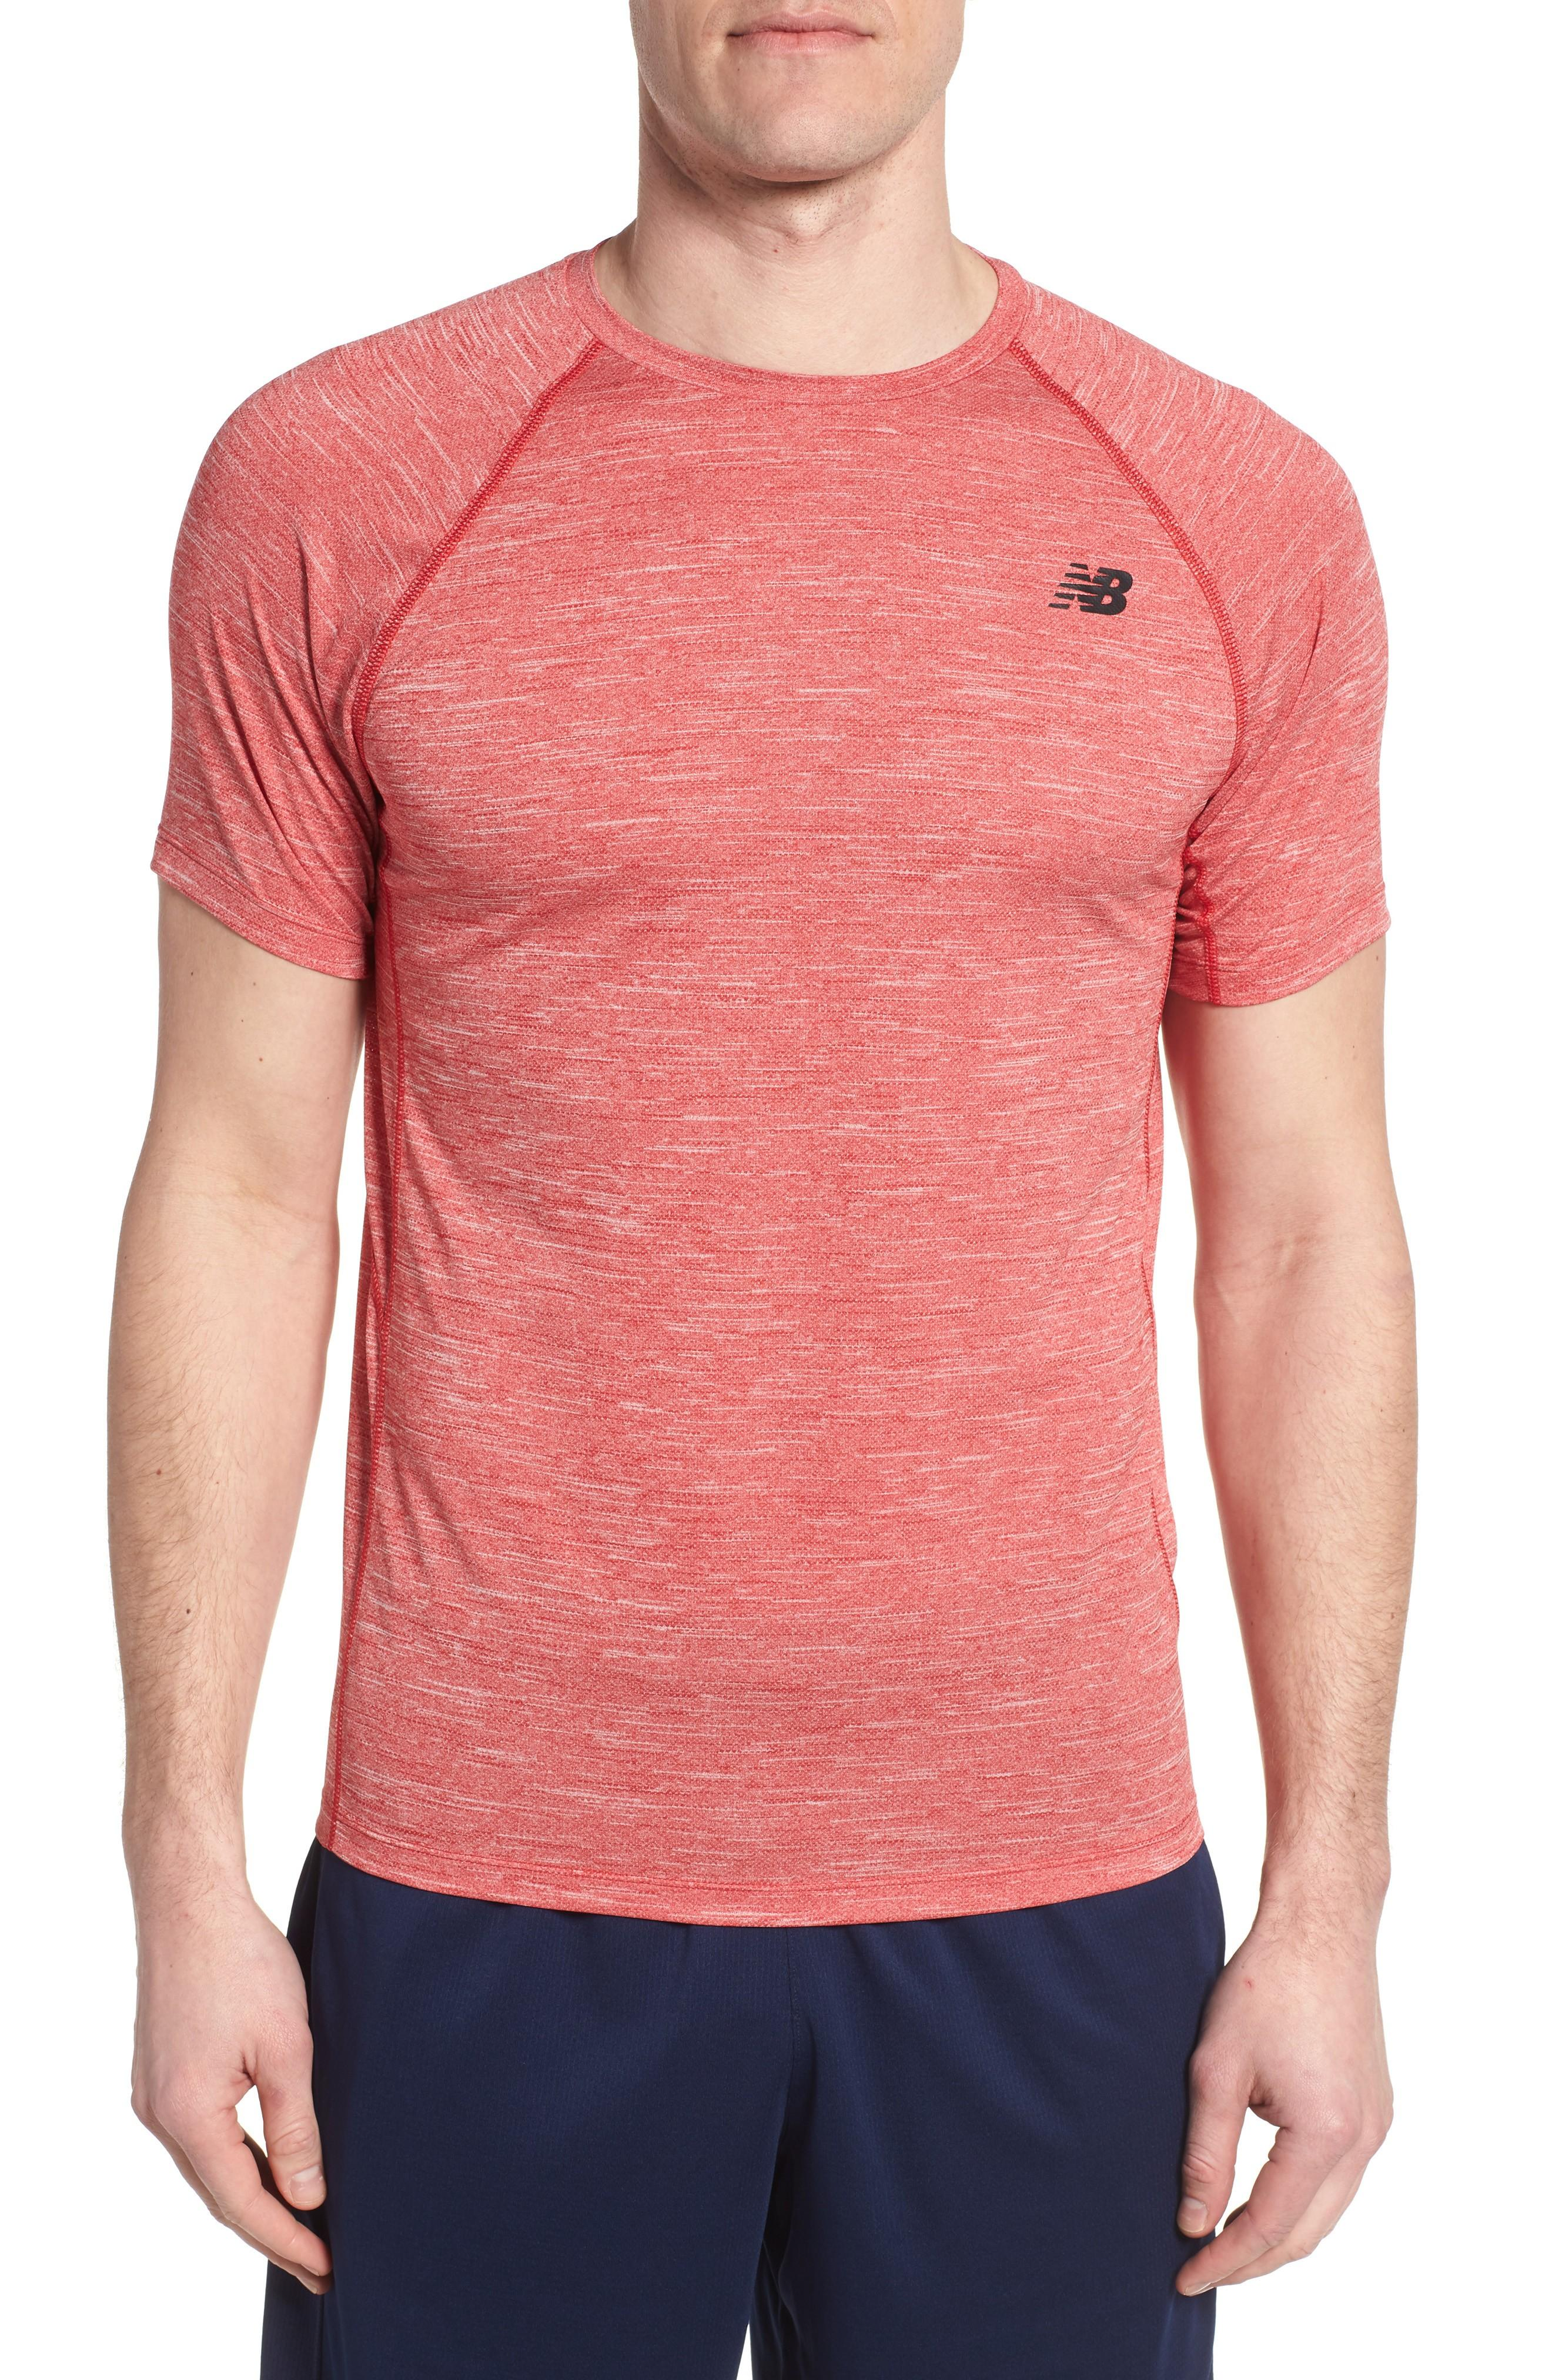 New Balance Tenacity Crewneck T-shirt In Team Red